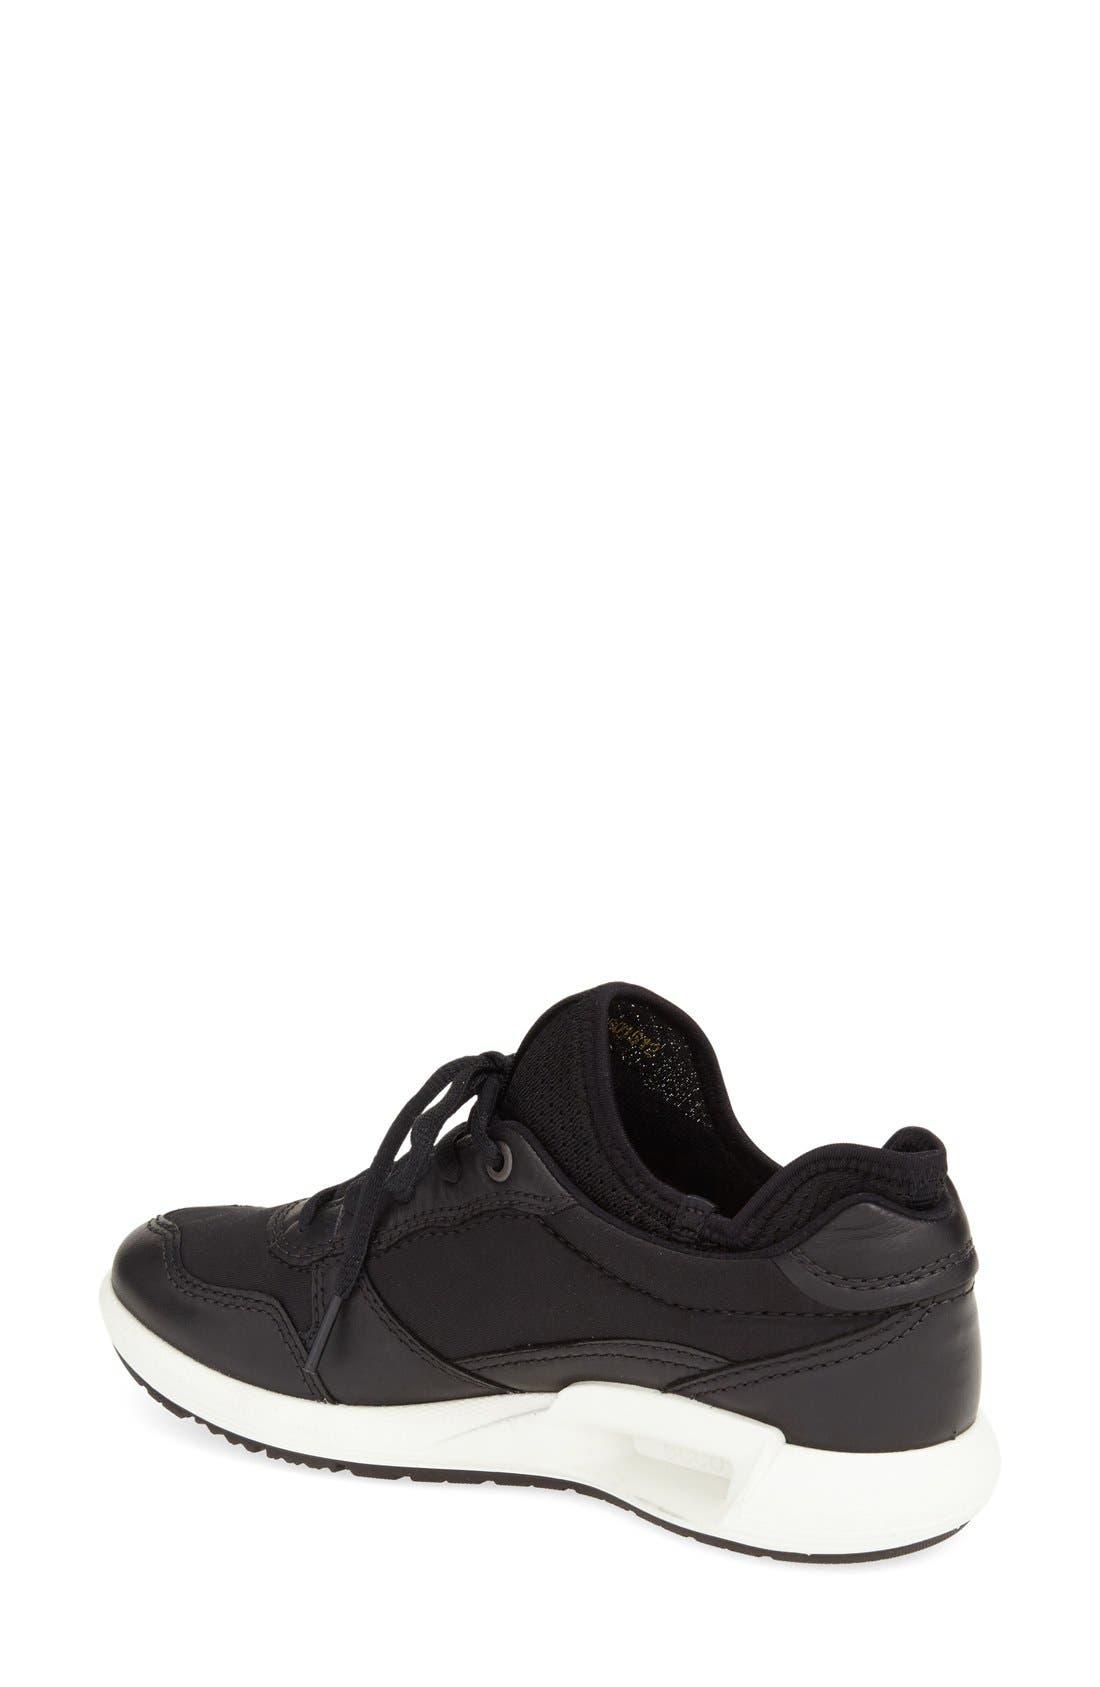 'CS16' Sneaker,                             Alternate thumbnail 3, color,                             001